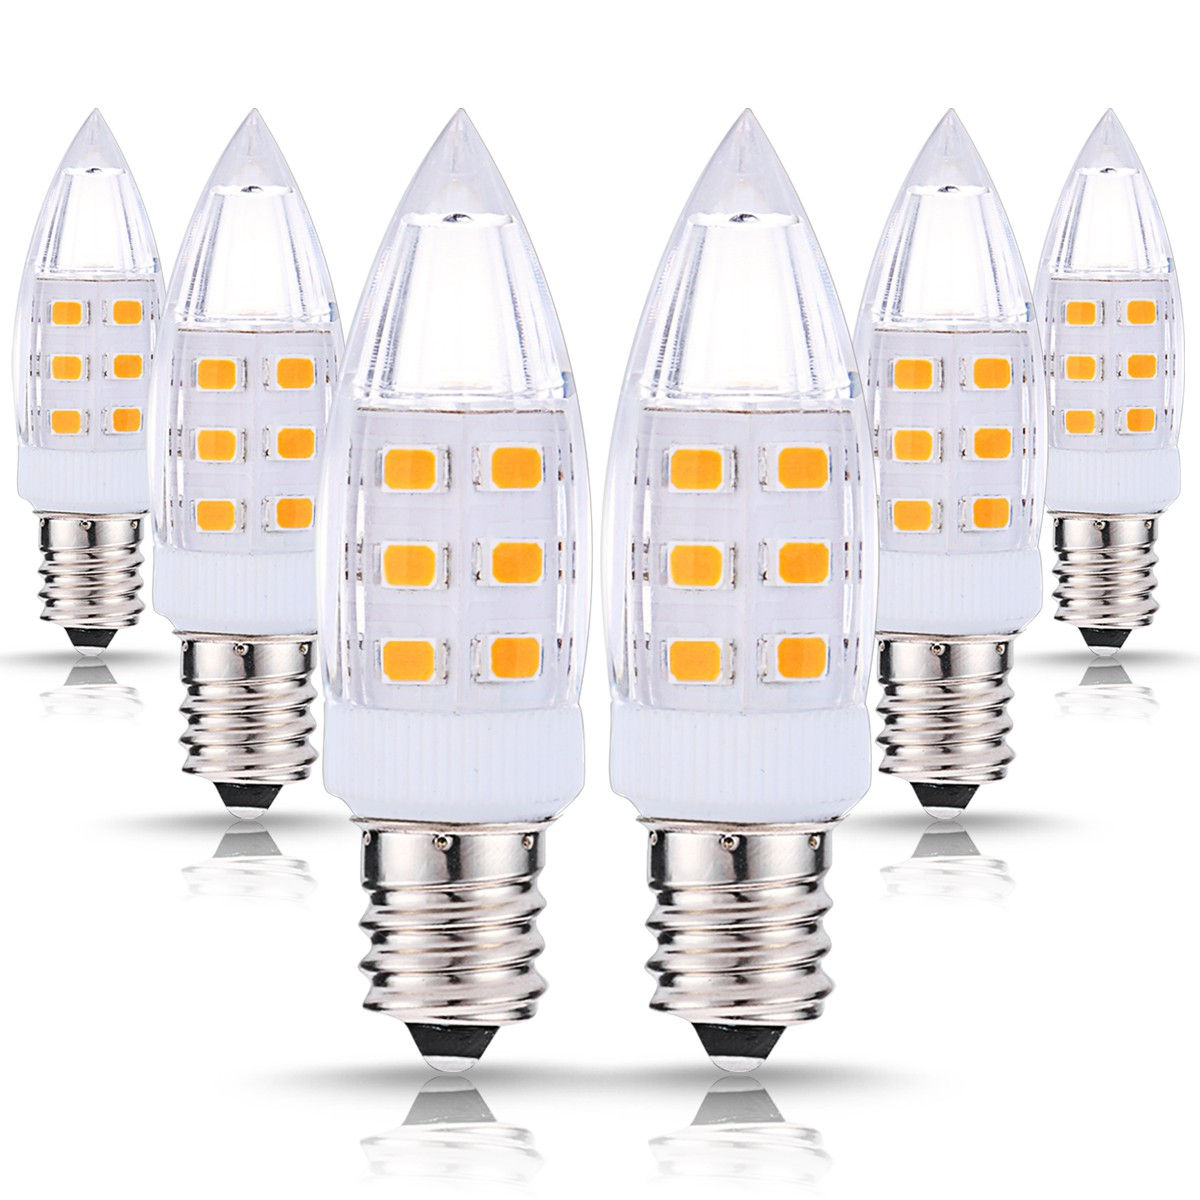 LOHAS LED C7 Night Light Bulbs, 1W (15W Incandescent Equivalent), 200LM, Natural Daylight White (4000K), Candelabra E12 Base Bulbs for Bedroom, Bathroom, 6Pack